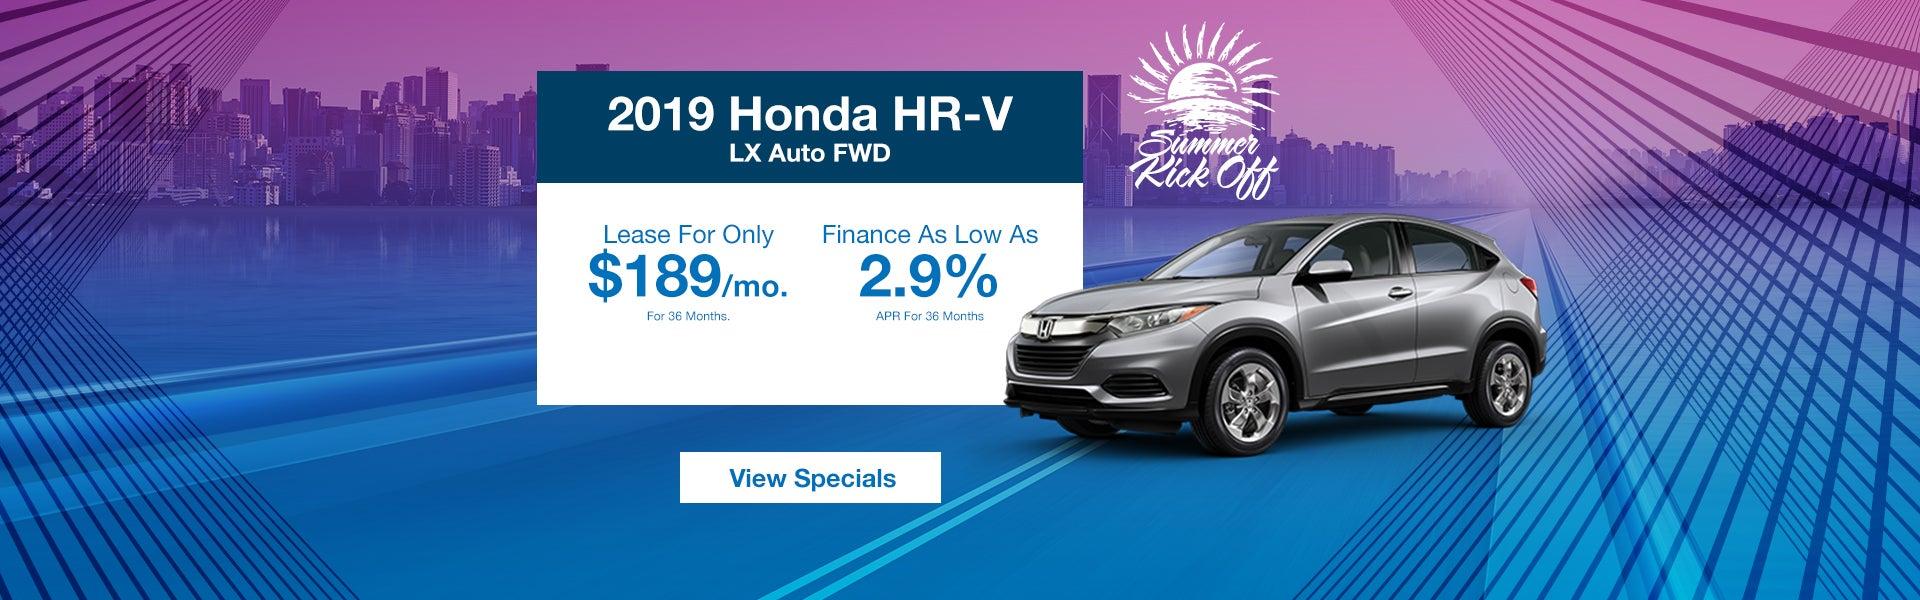 Honda Dealership Los Angeles >> Honda Dealership Los Angeles More You Must To Know